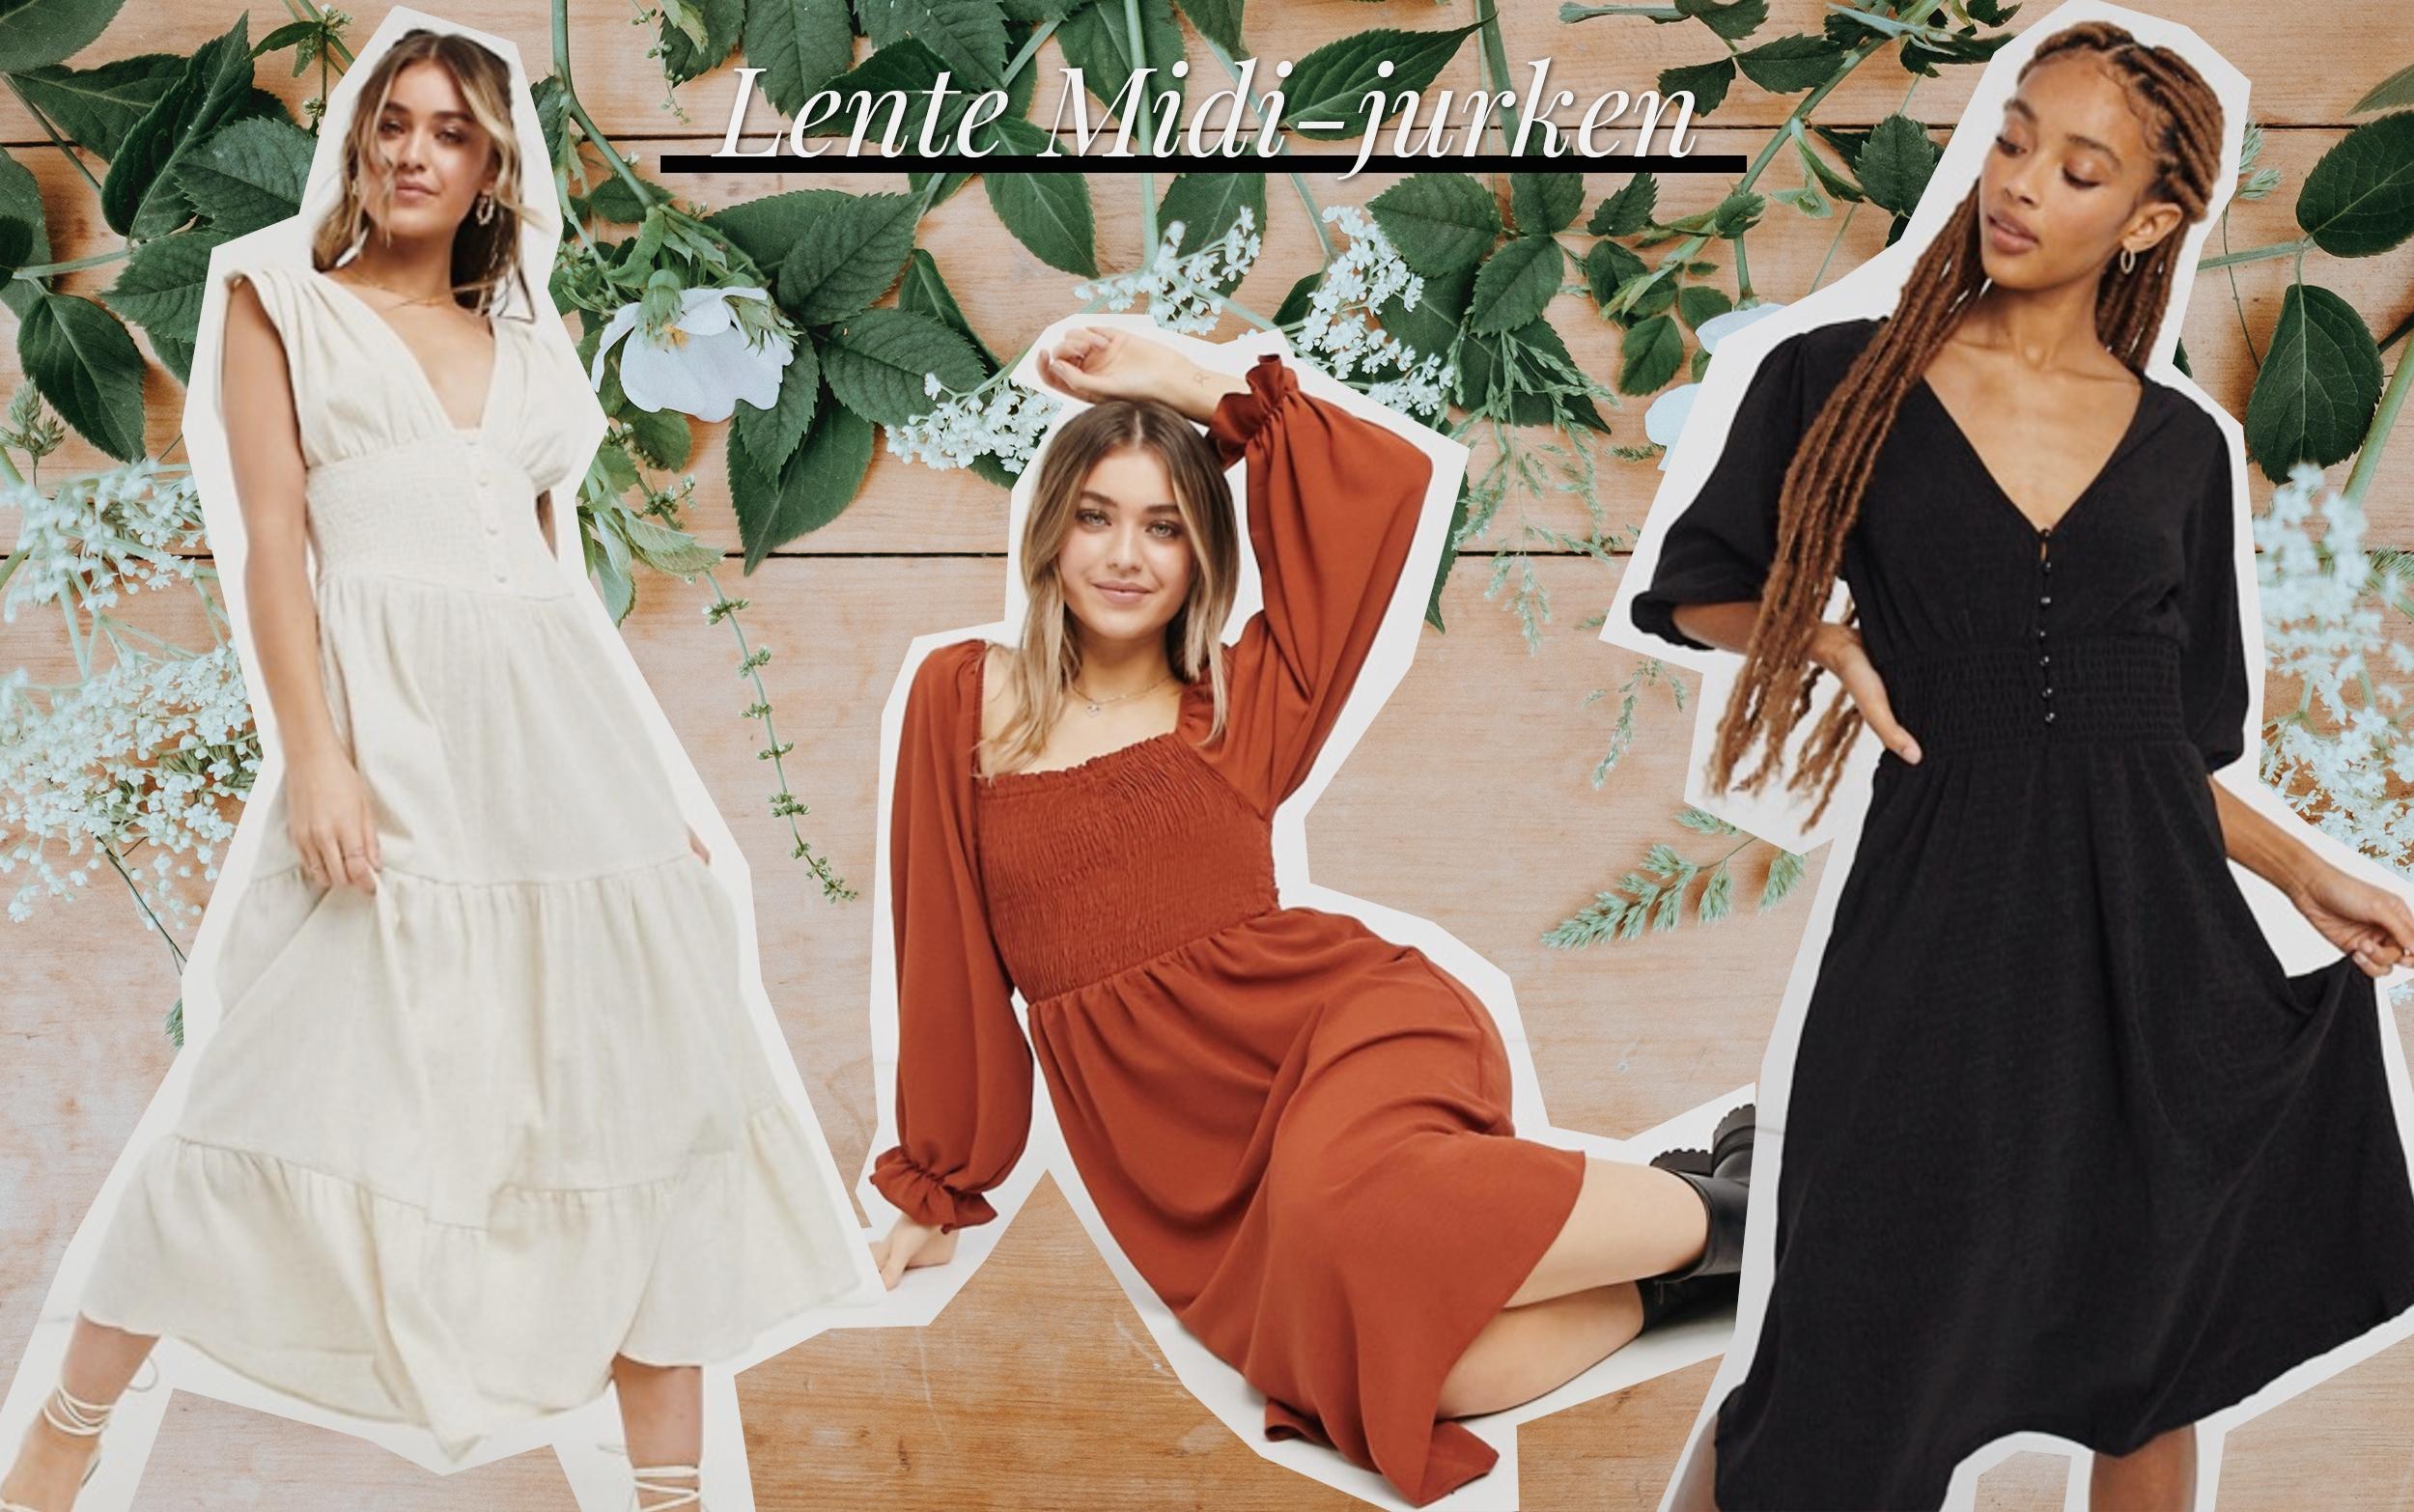 Oktoberdots Mooiste Midi-jurken voor de Lente